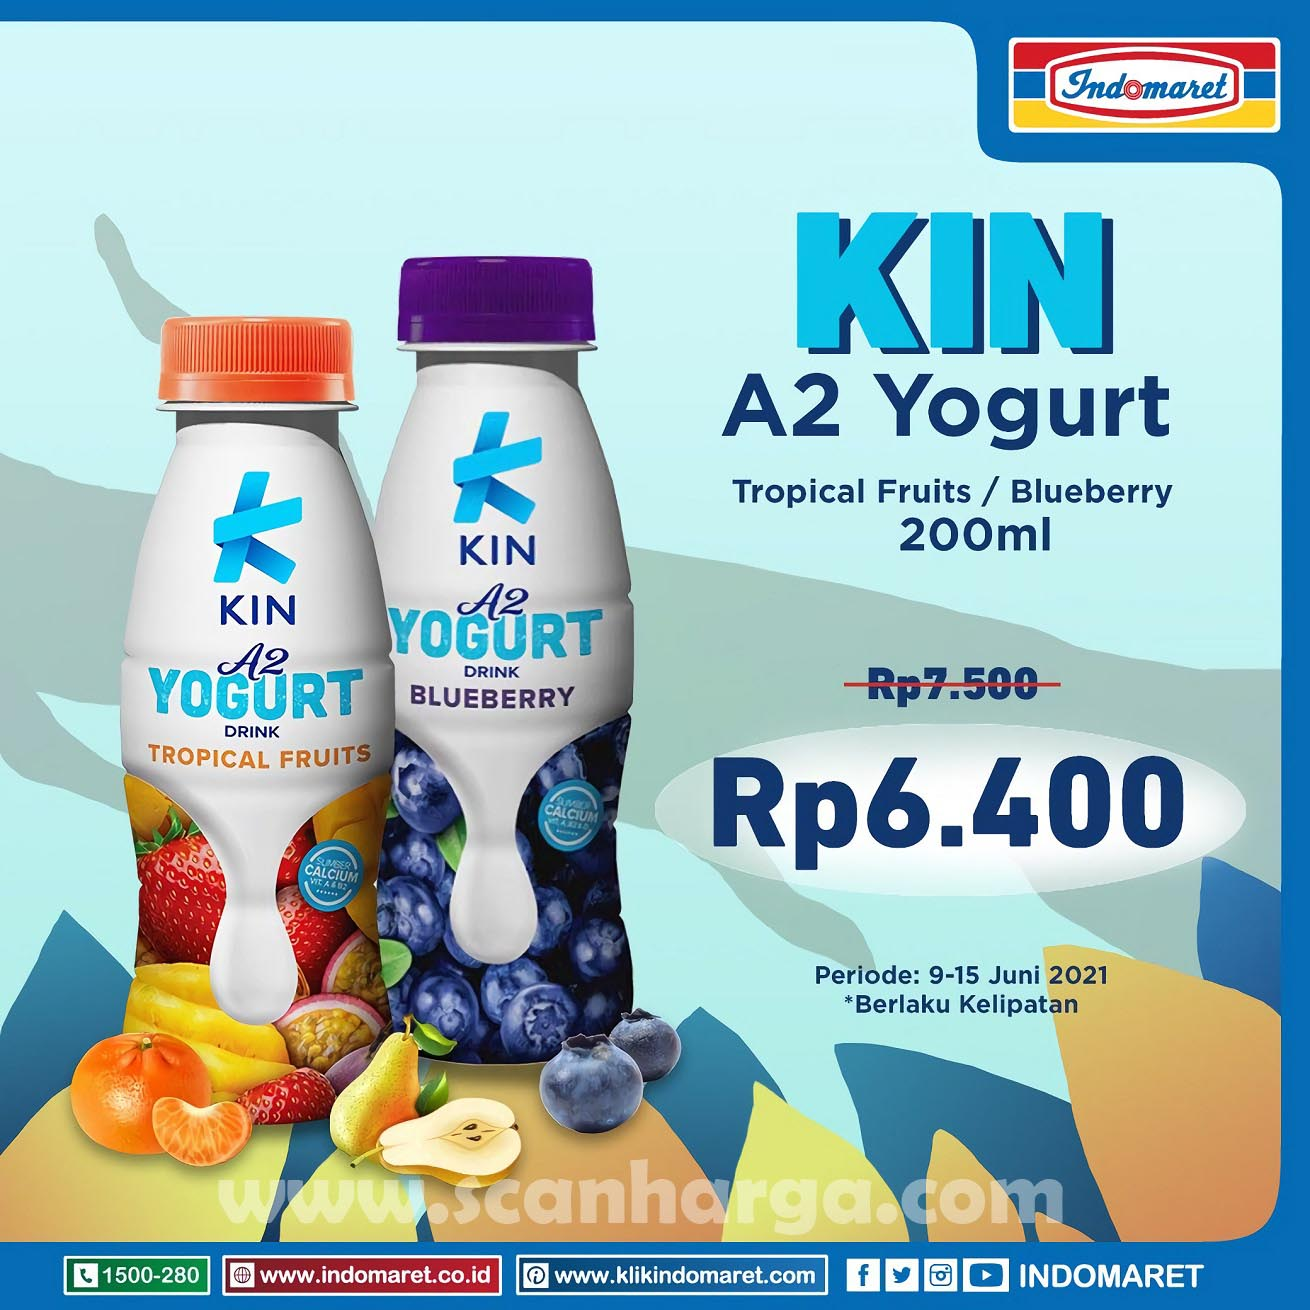 Promo INDOMARET Harga Spesial KIN Yogurt 1